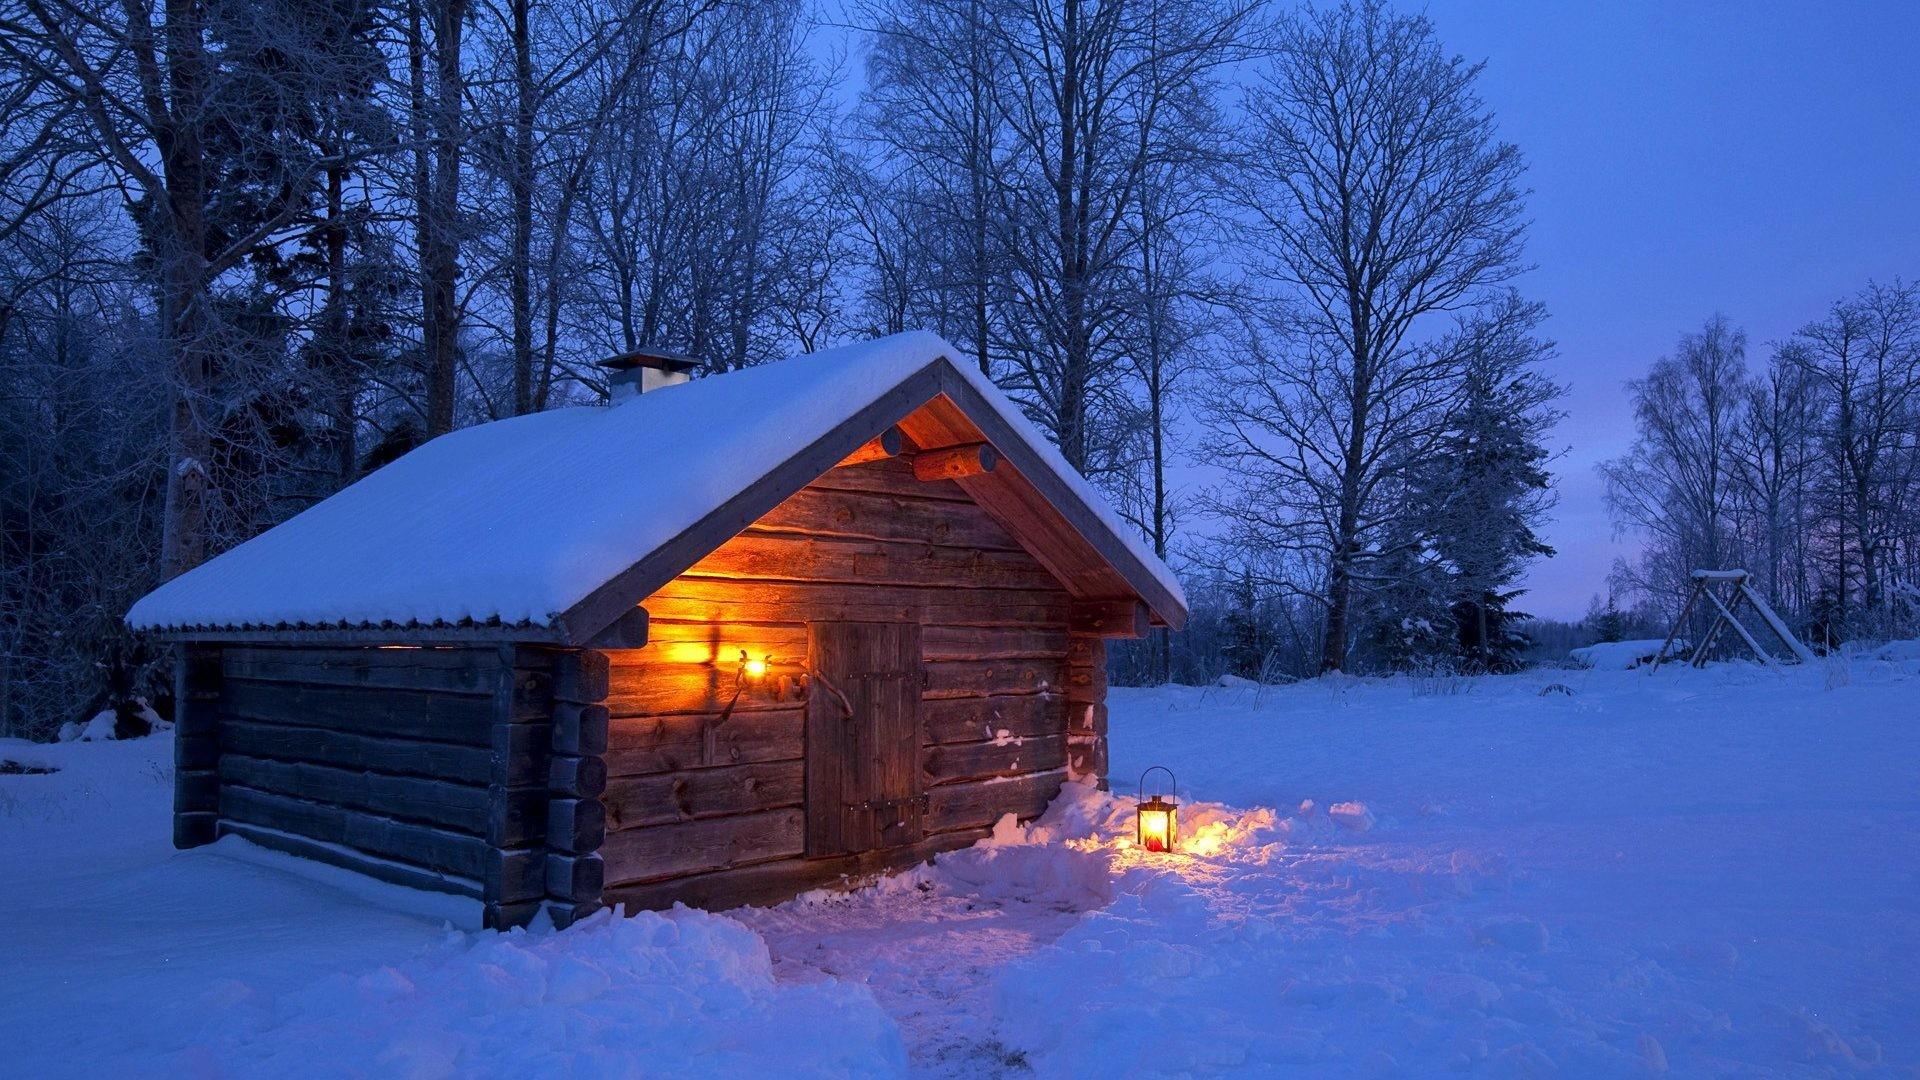 Winter Cabin Wallpaper 71 Pictures